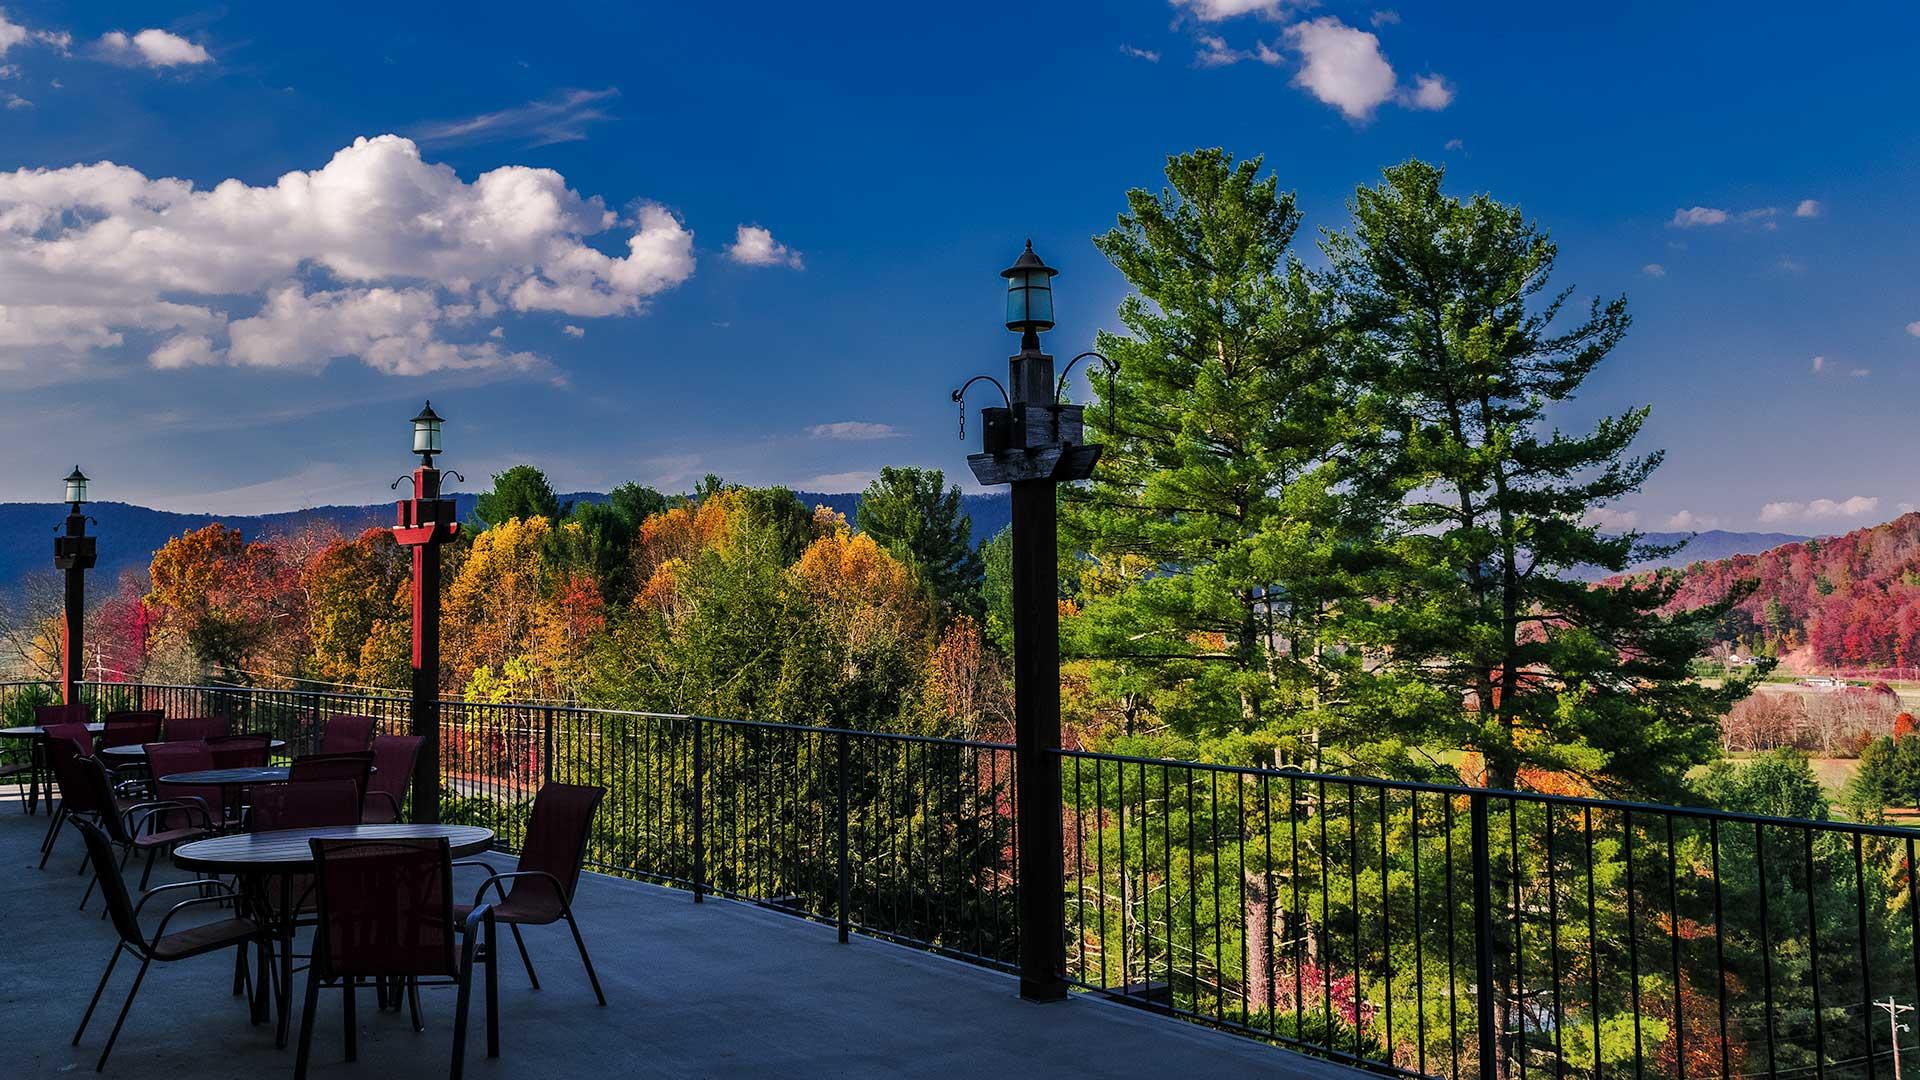 redtail mountain resort | vistas land & sea